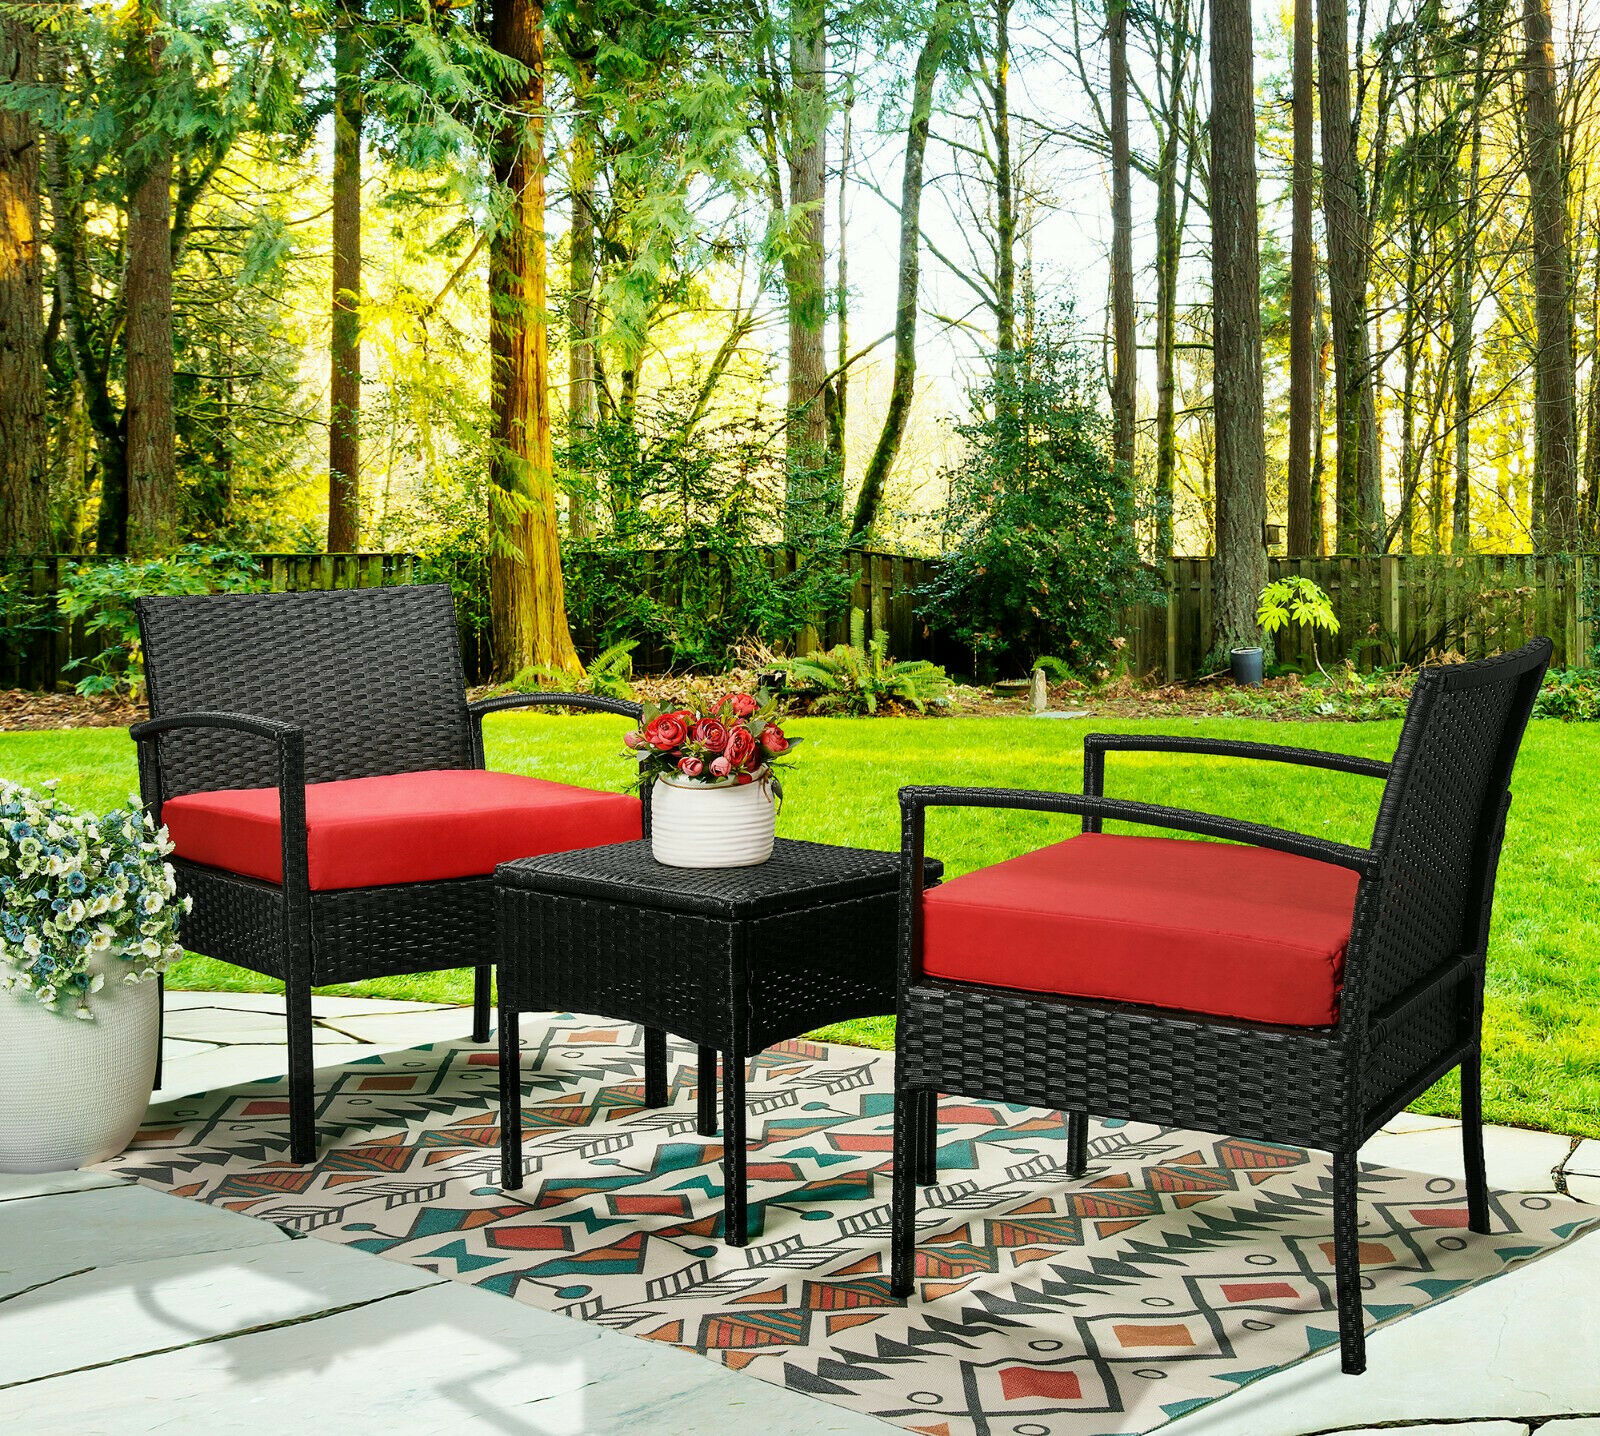 Garden Furniture - 3PCS Wicker Rattan Patio Furniture Sofa Set Cushion Coffee Table Garden Outdoor